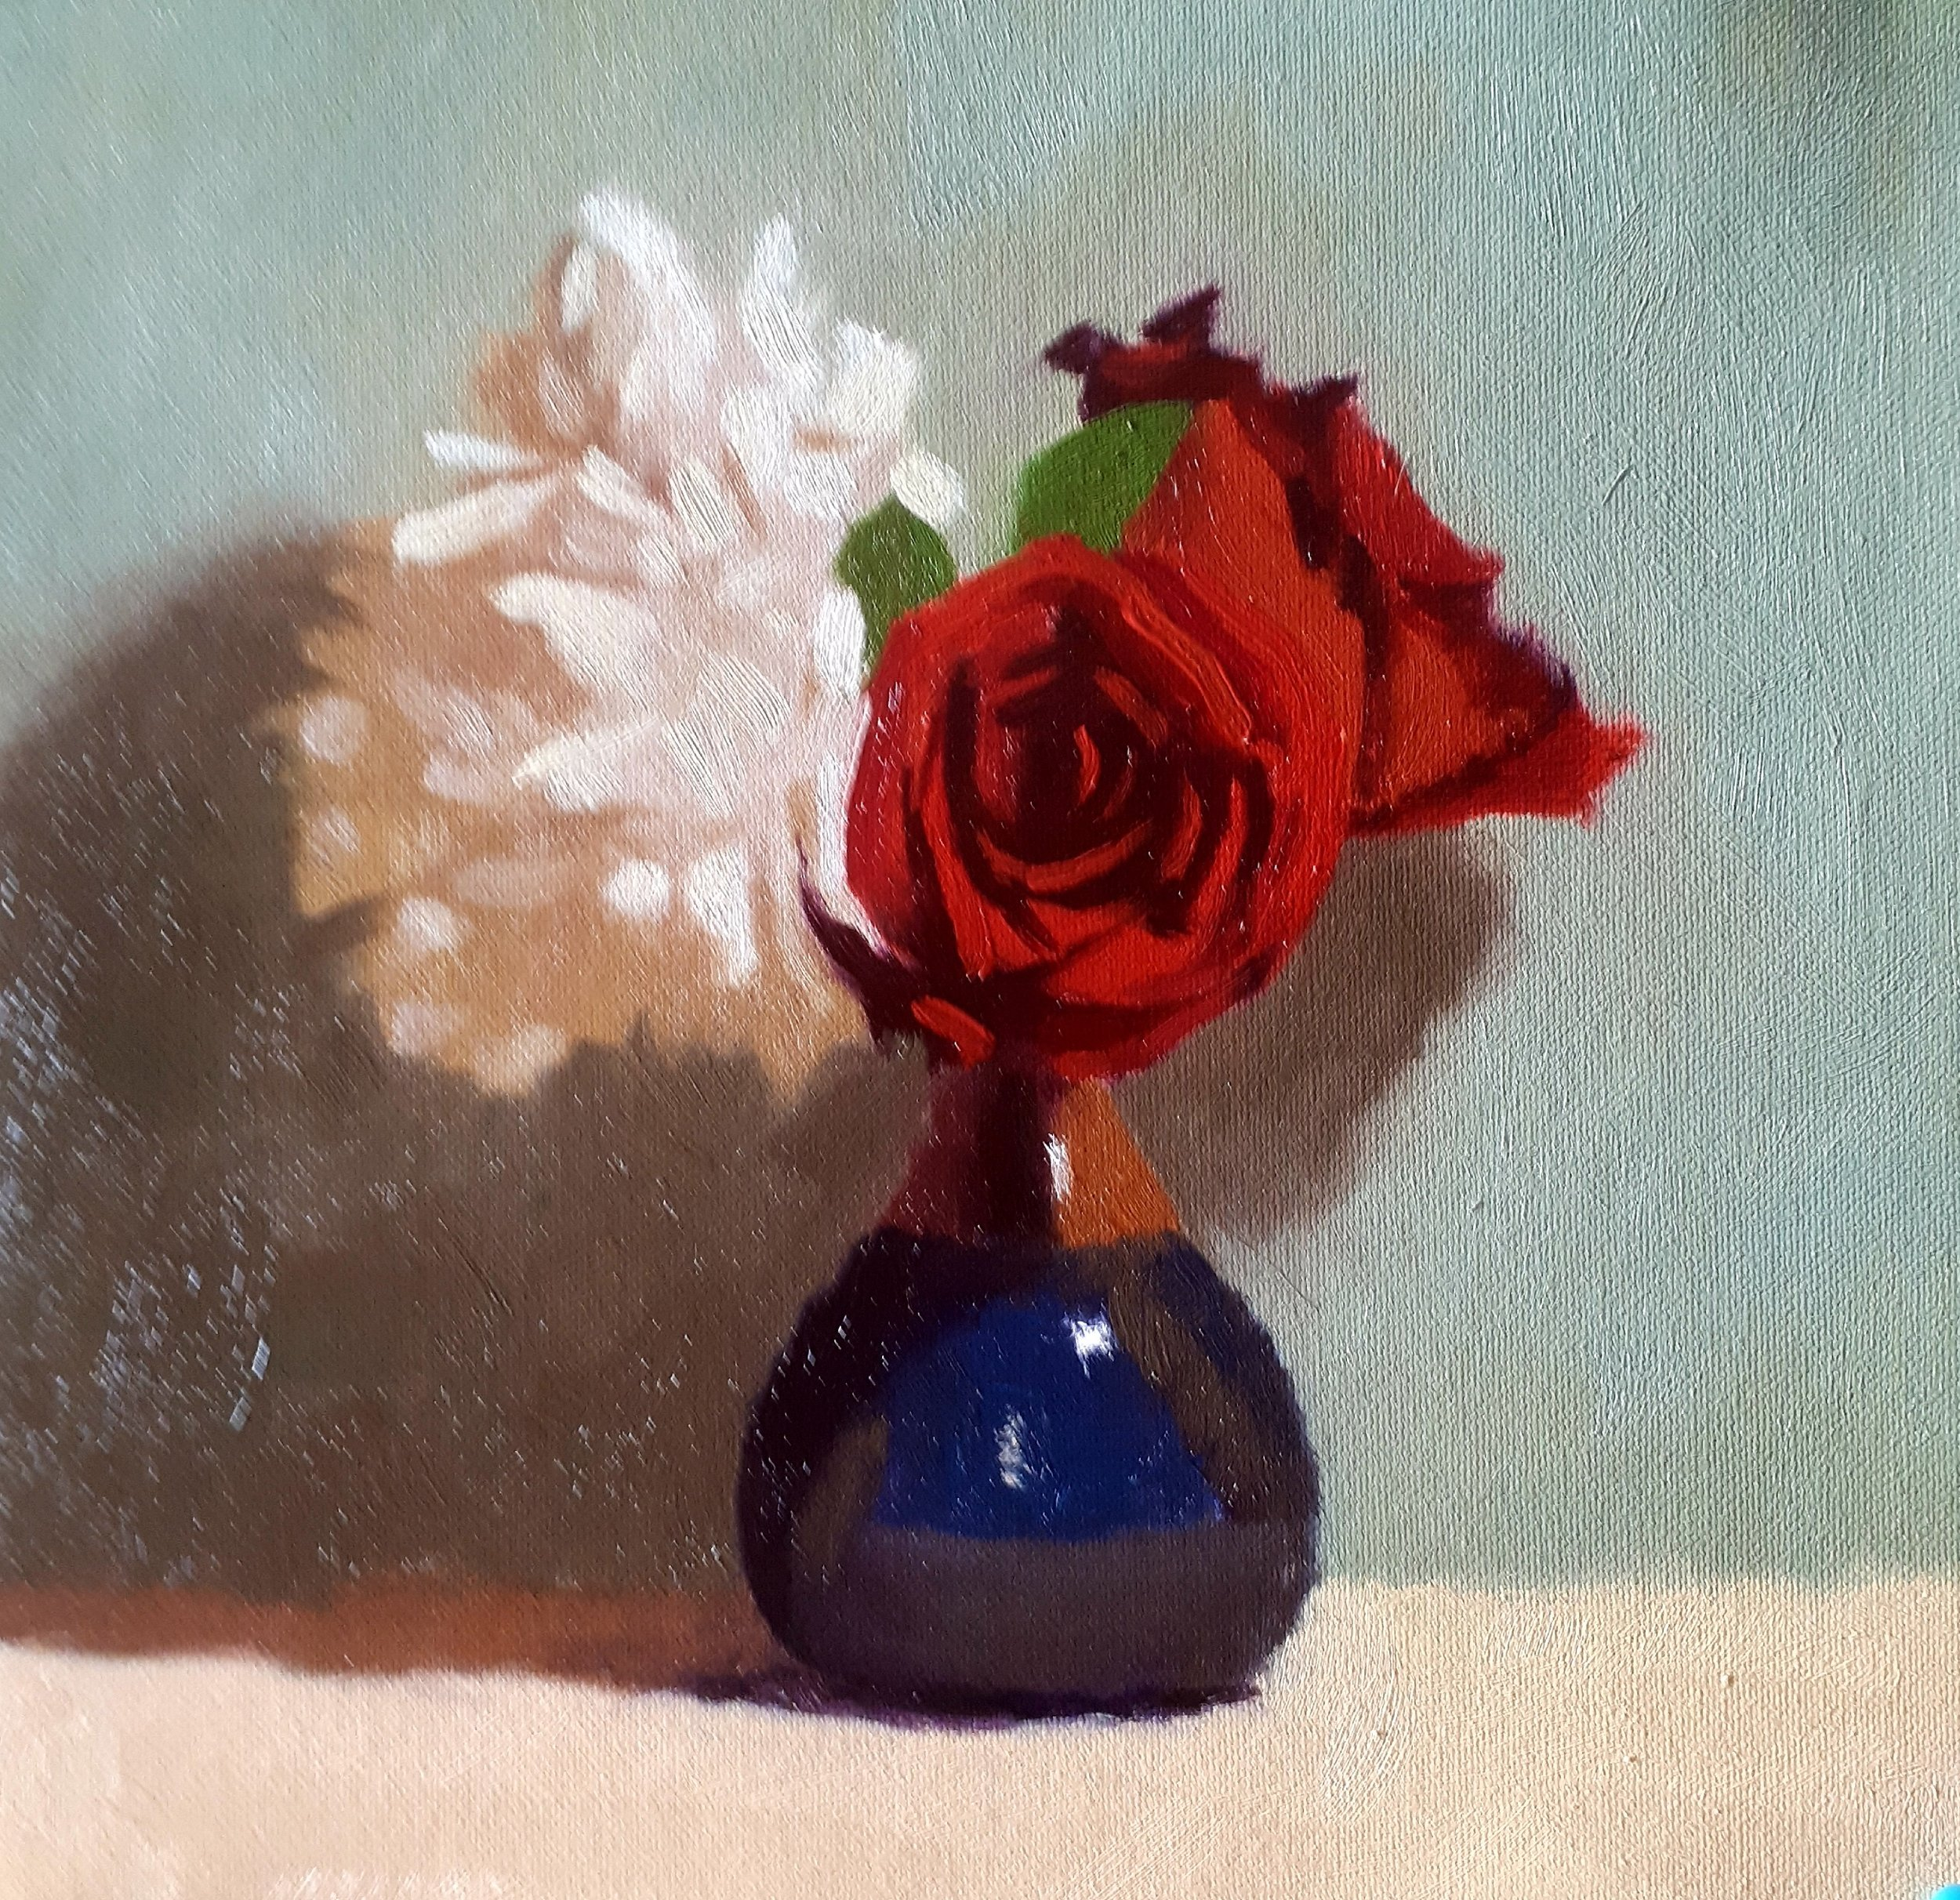 Jinxy's Rose